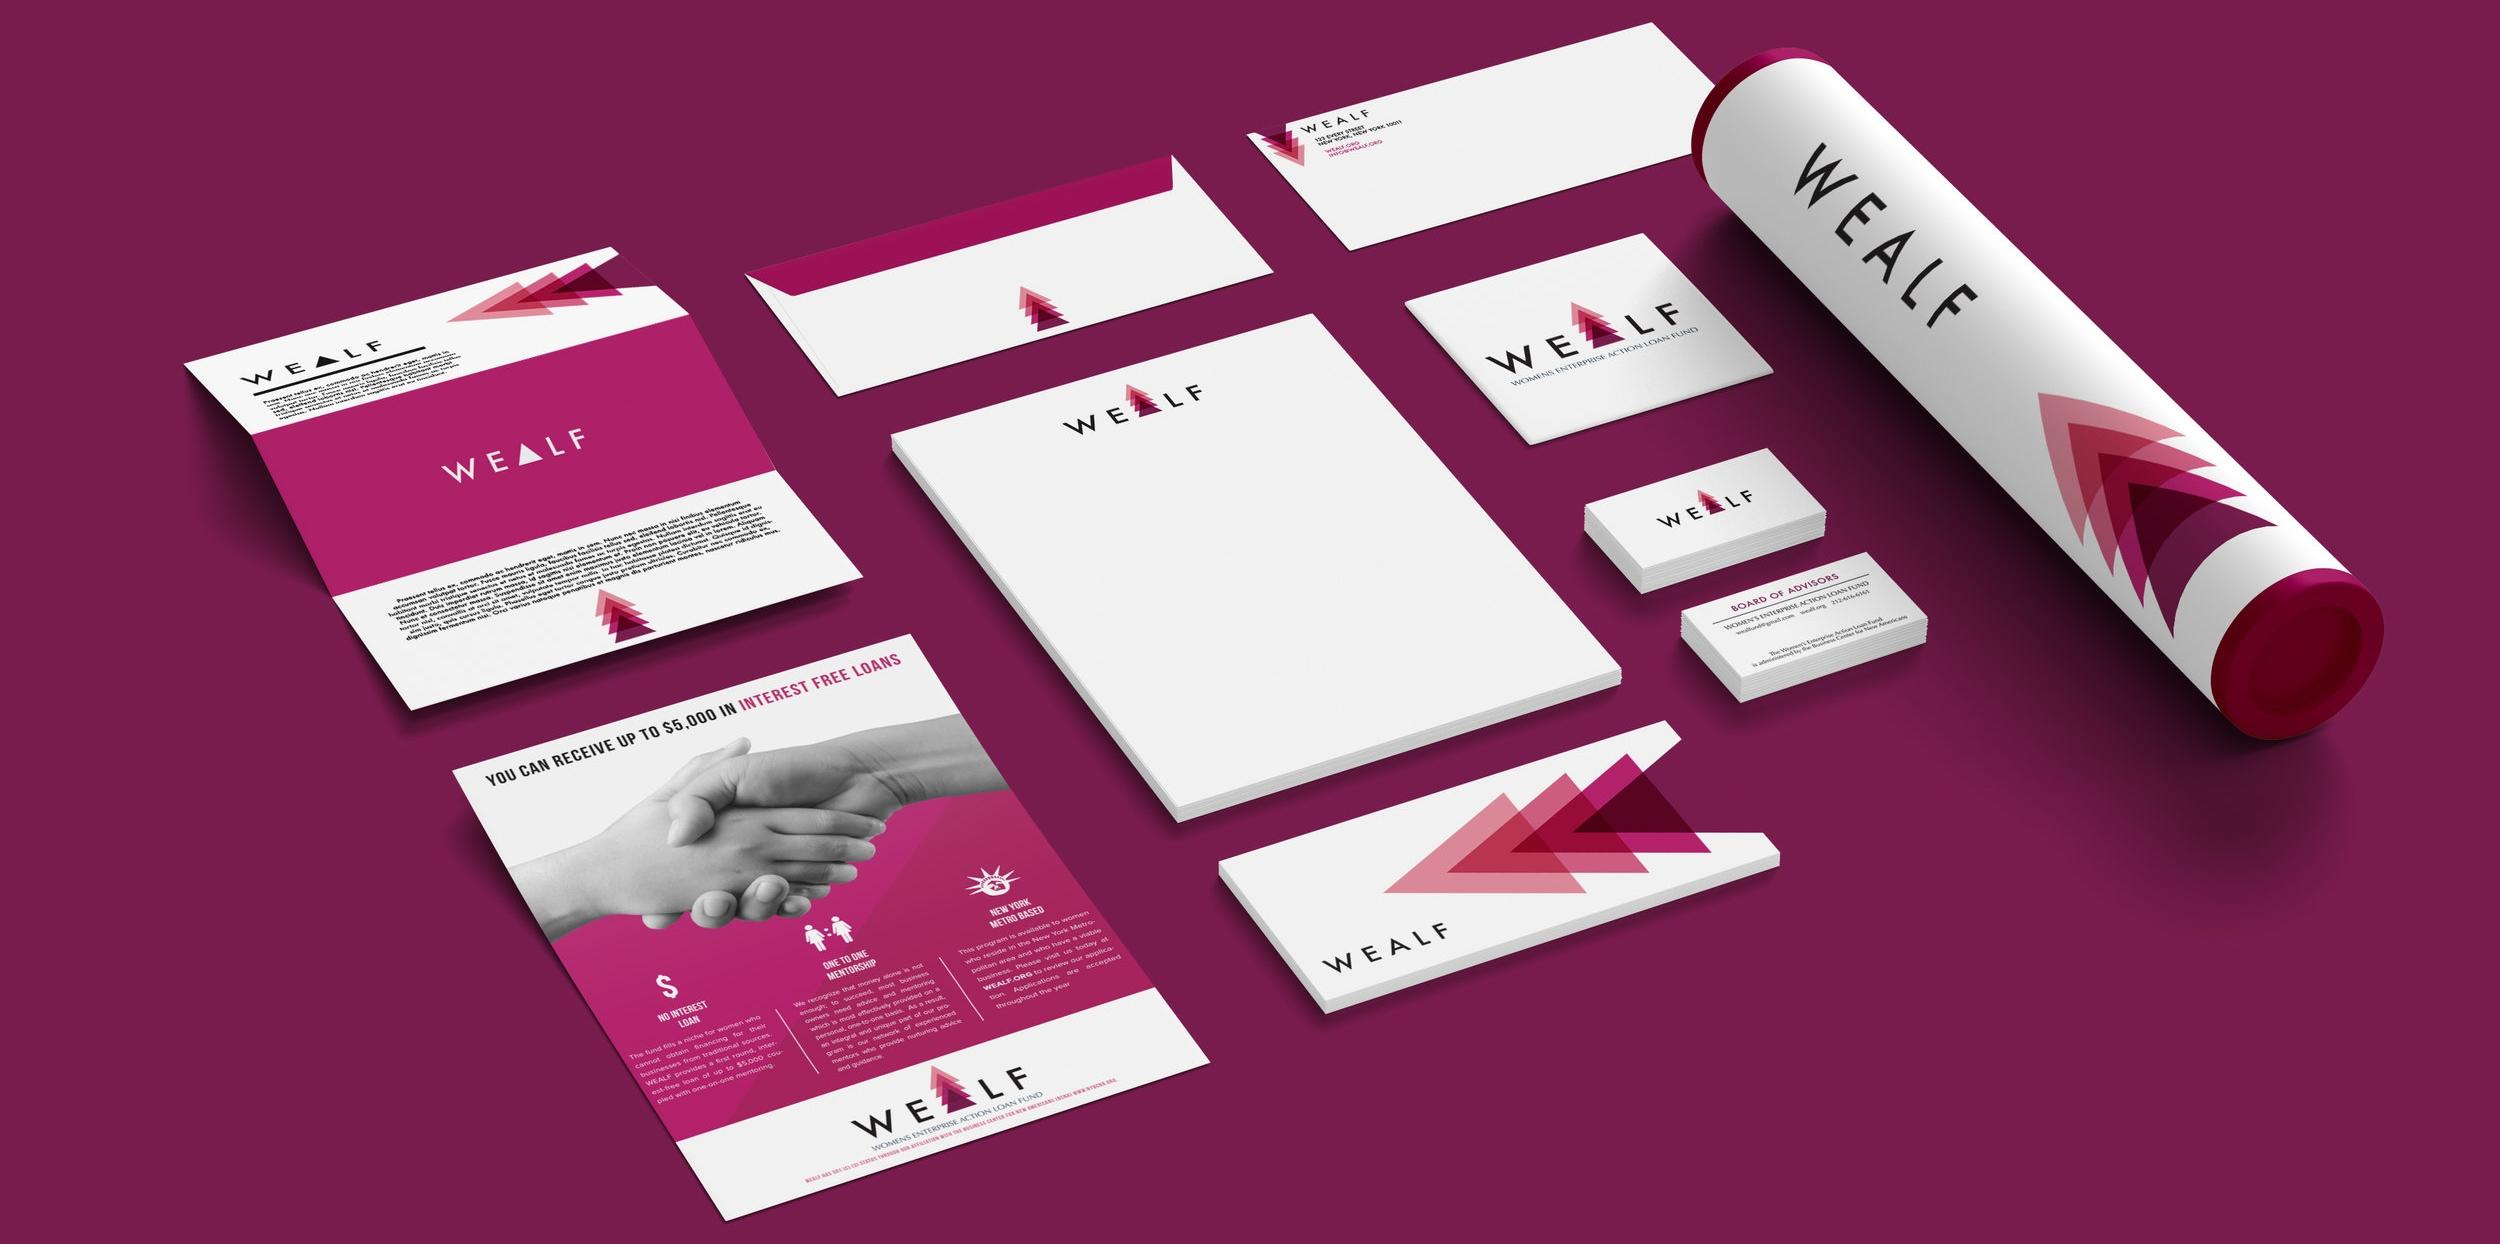 erica simon graphic design